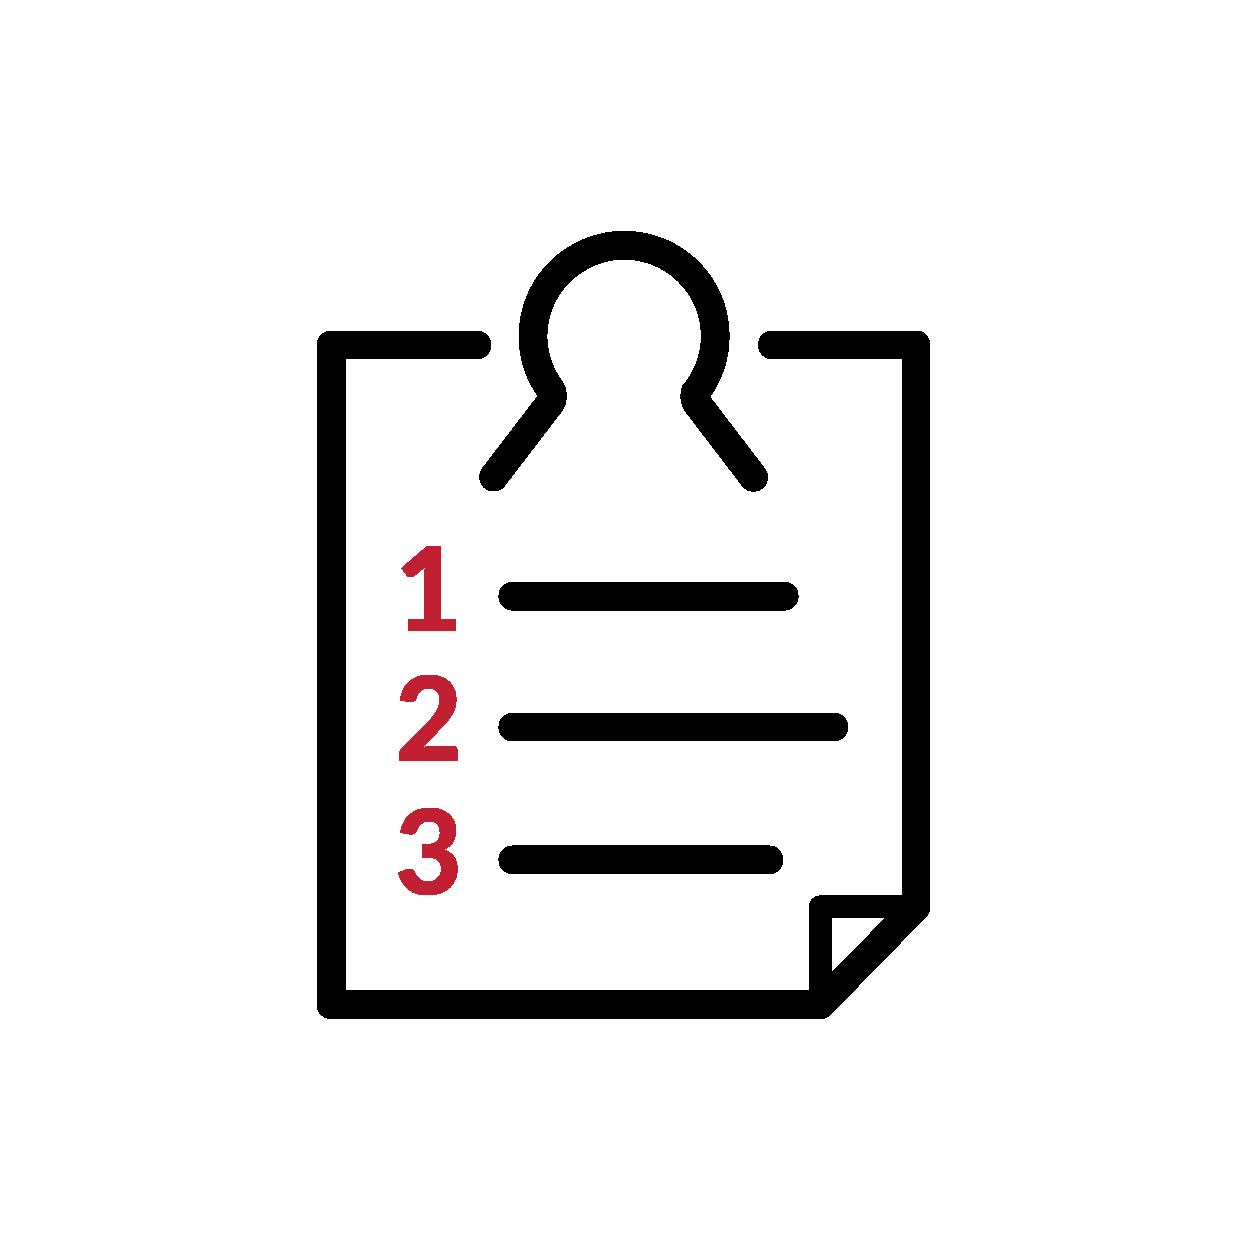 Basic Deck Icons_IdentifyCriticalRoles-List